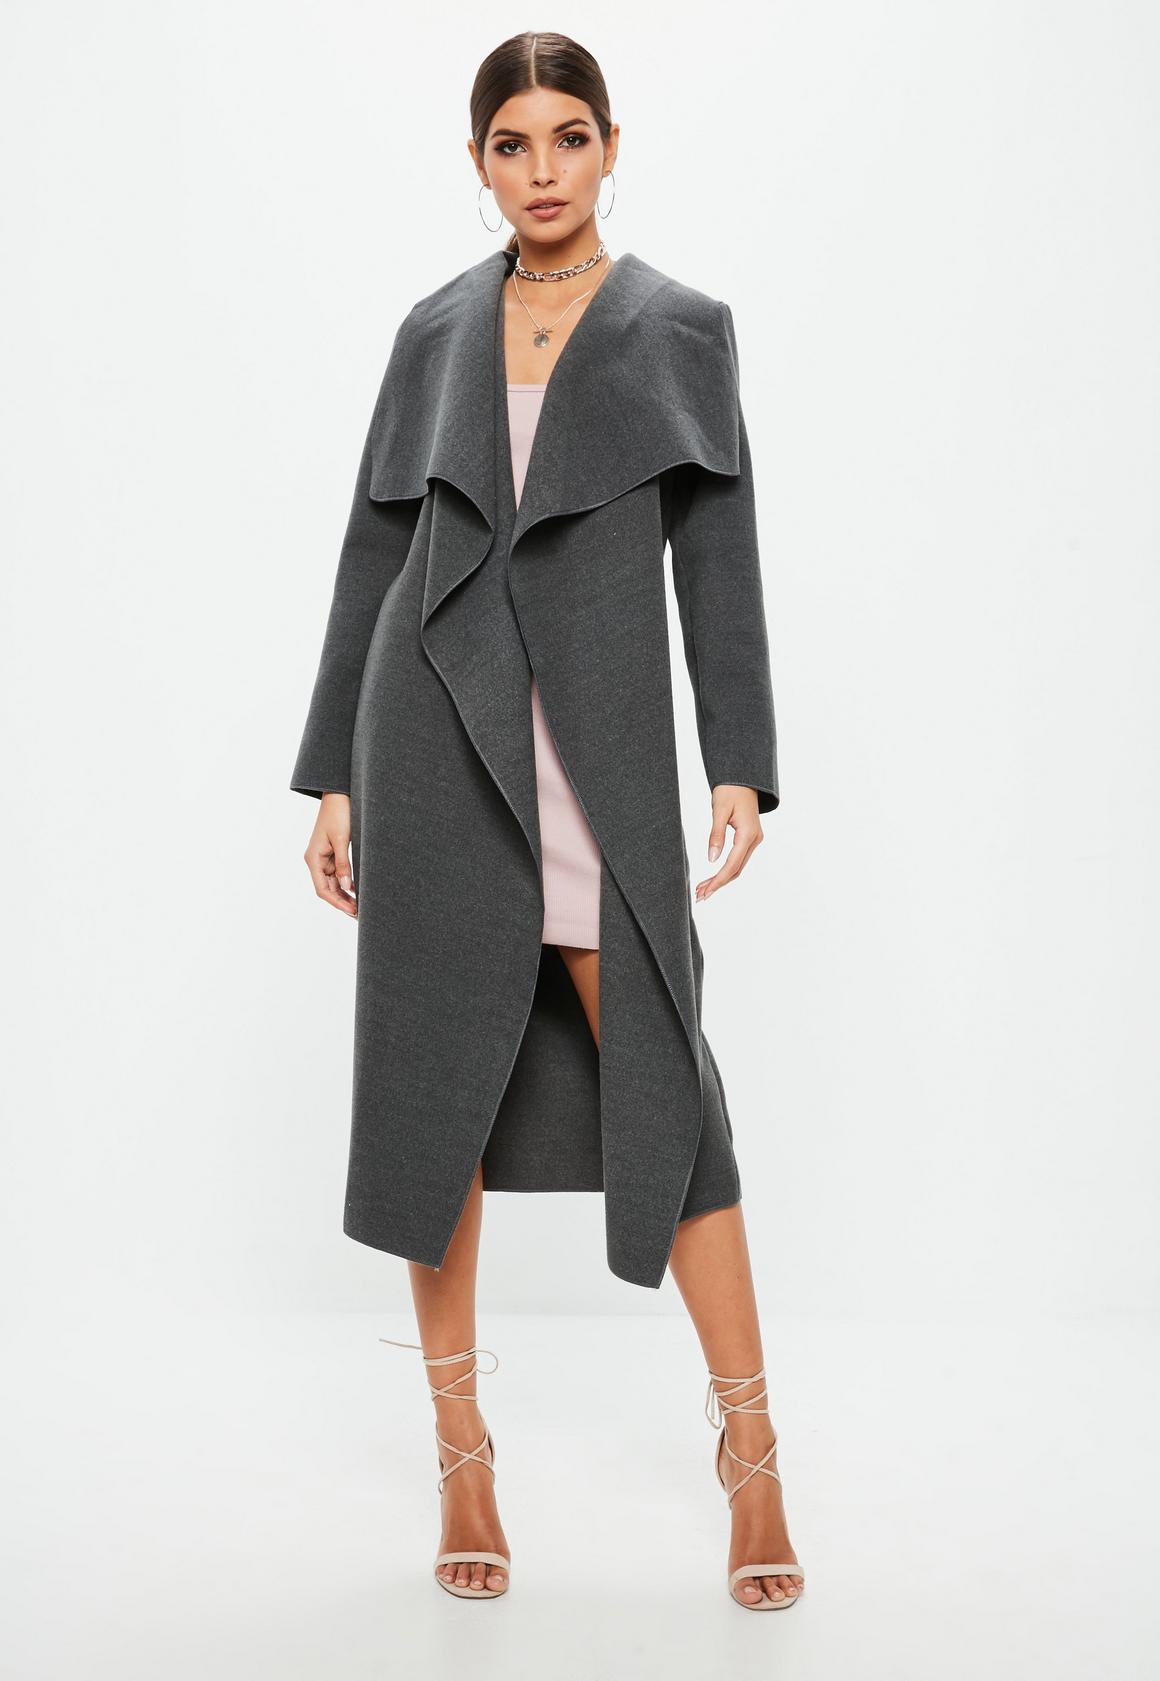 Duster Coat | Women's Long Duster Jacket - Missguided